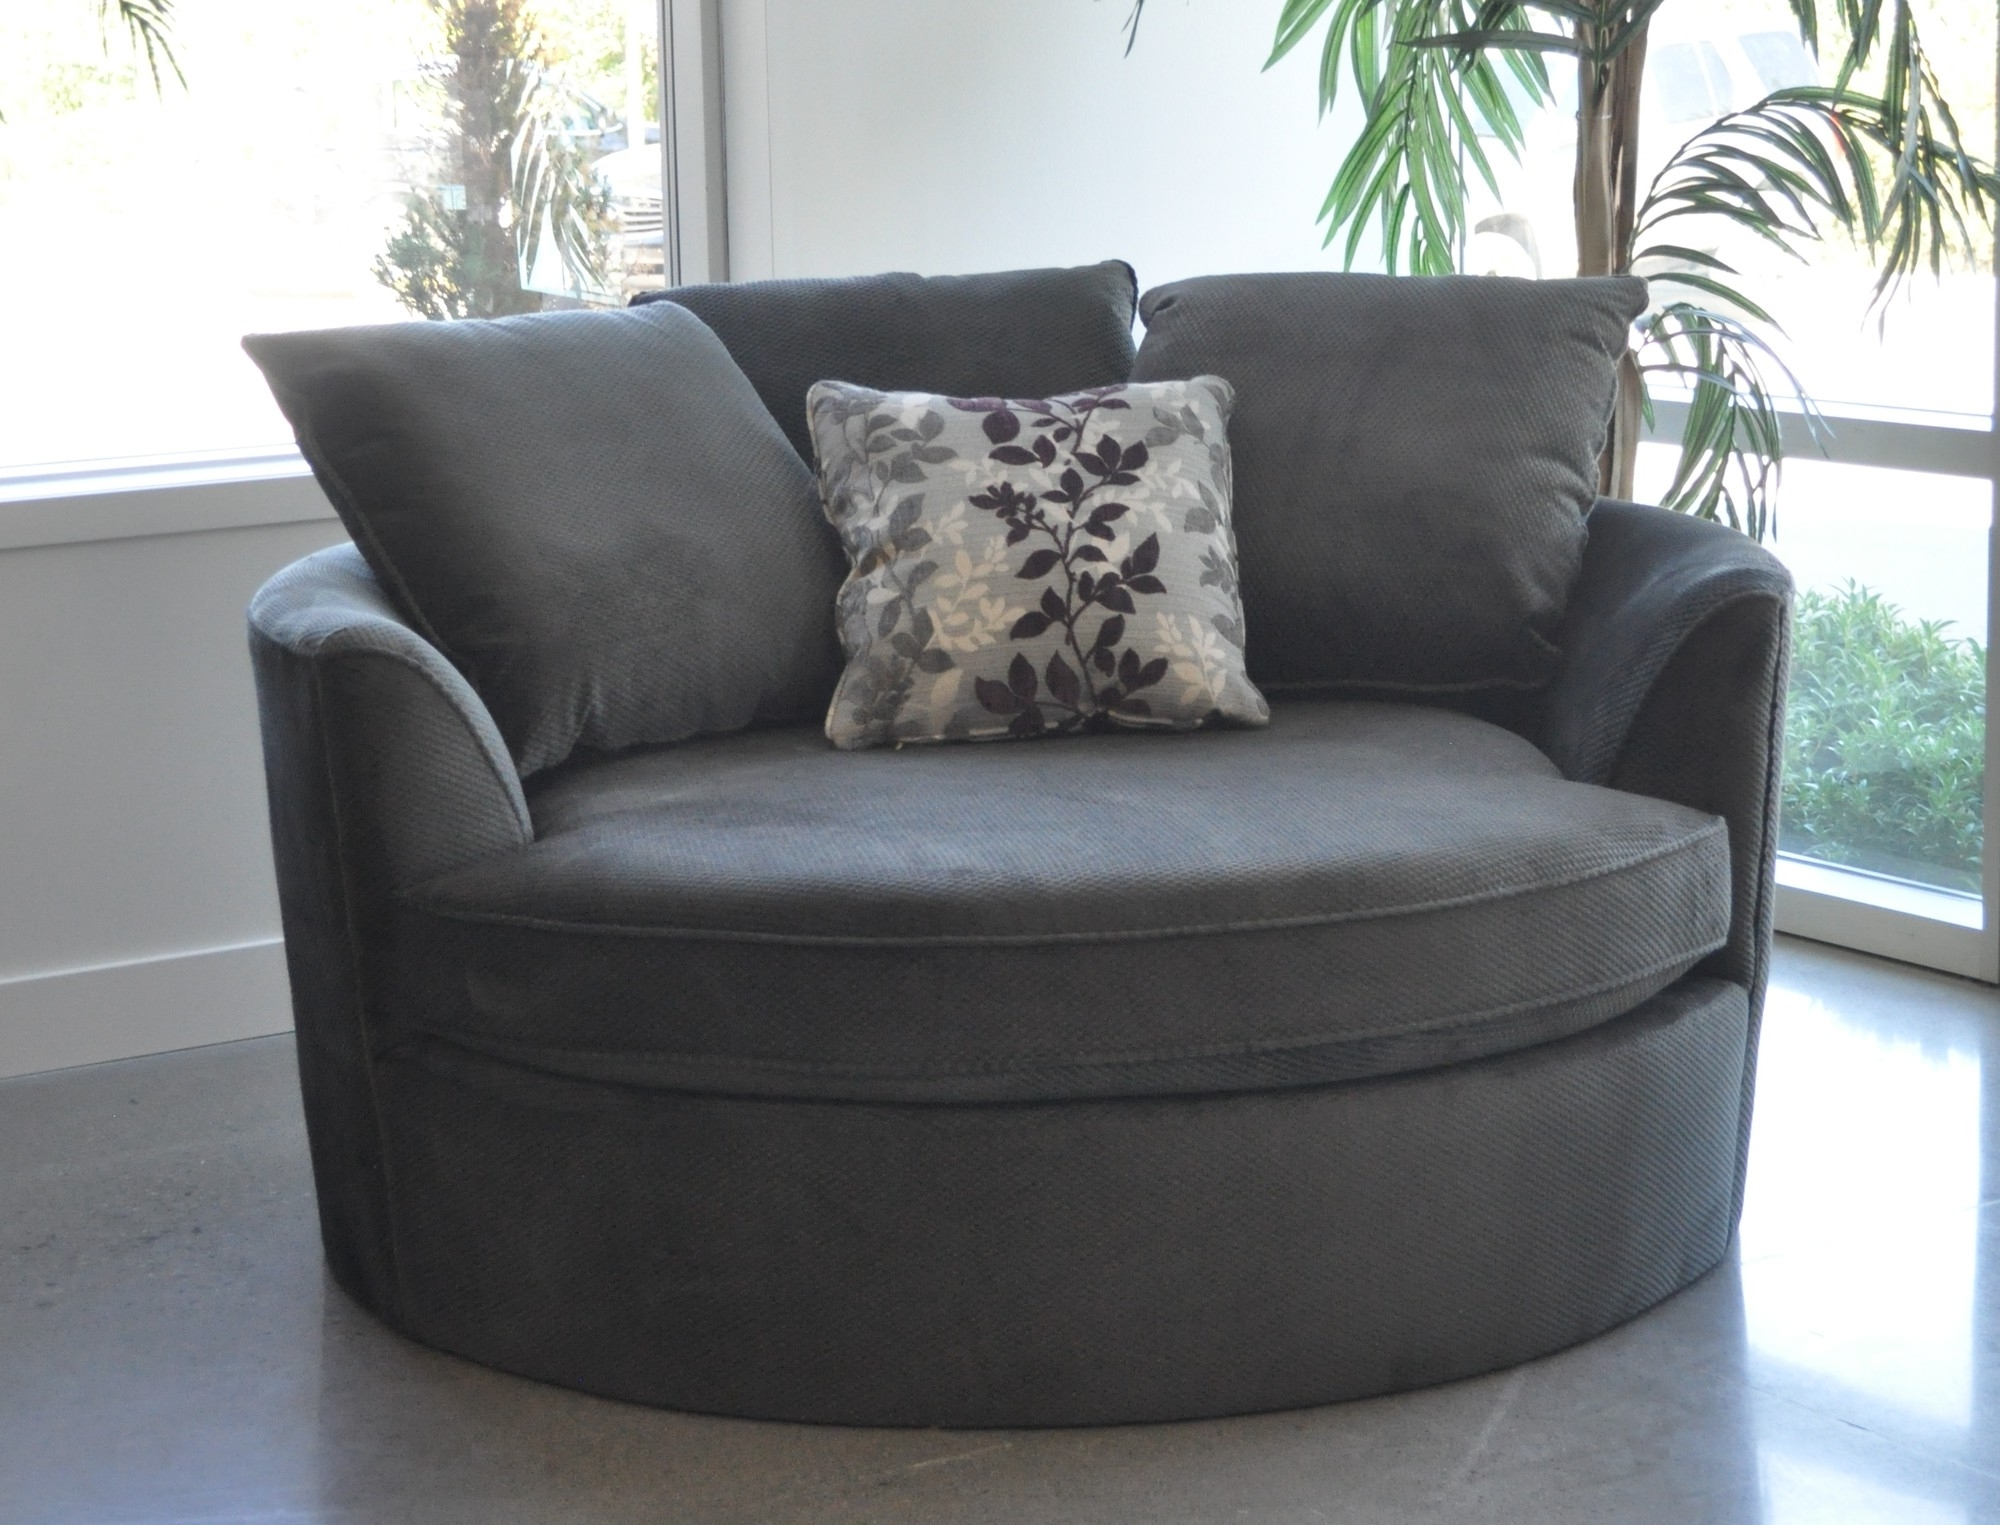 Preferred Sofa : Round Sofa Outdoor Furniture Round Sofa Chair Uk Large Inside Large Sofa Chairs (View 11 of 20)